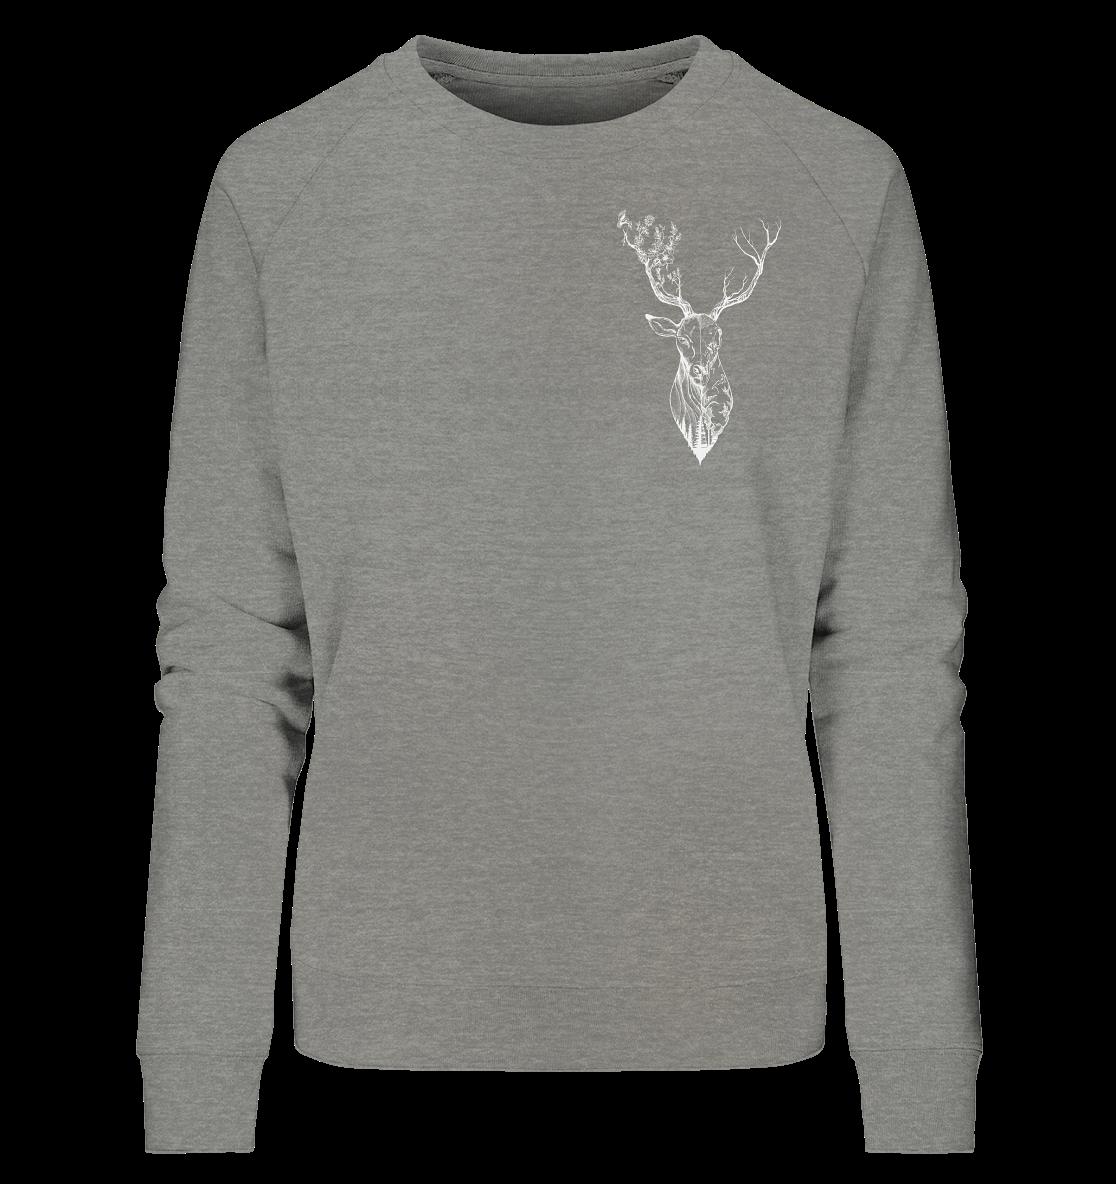 front-ladies-organic-sweatshirt-818381-1116x-12.png